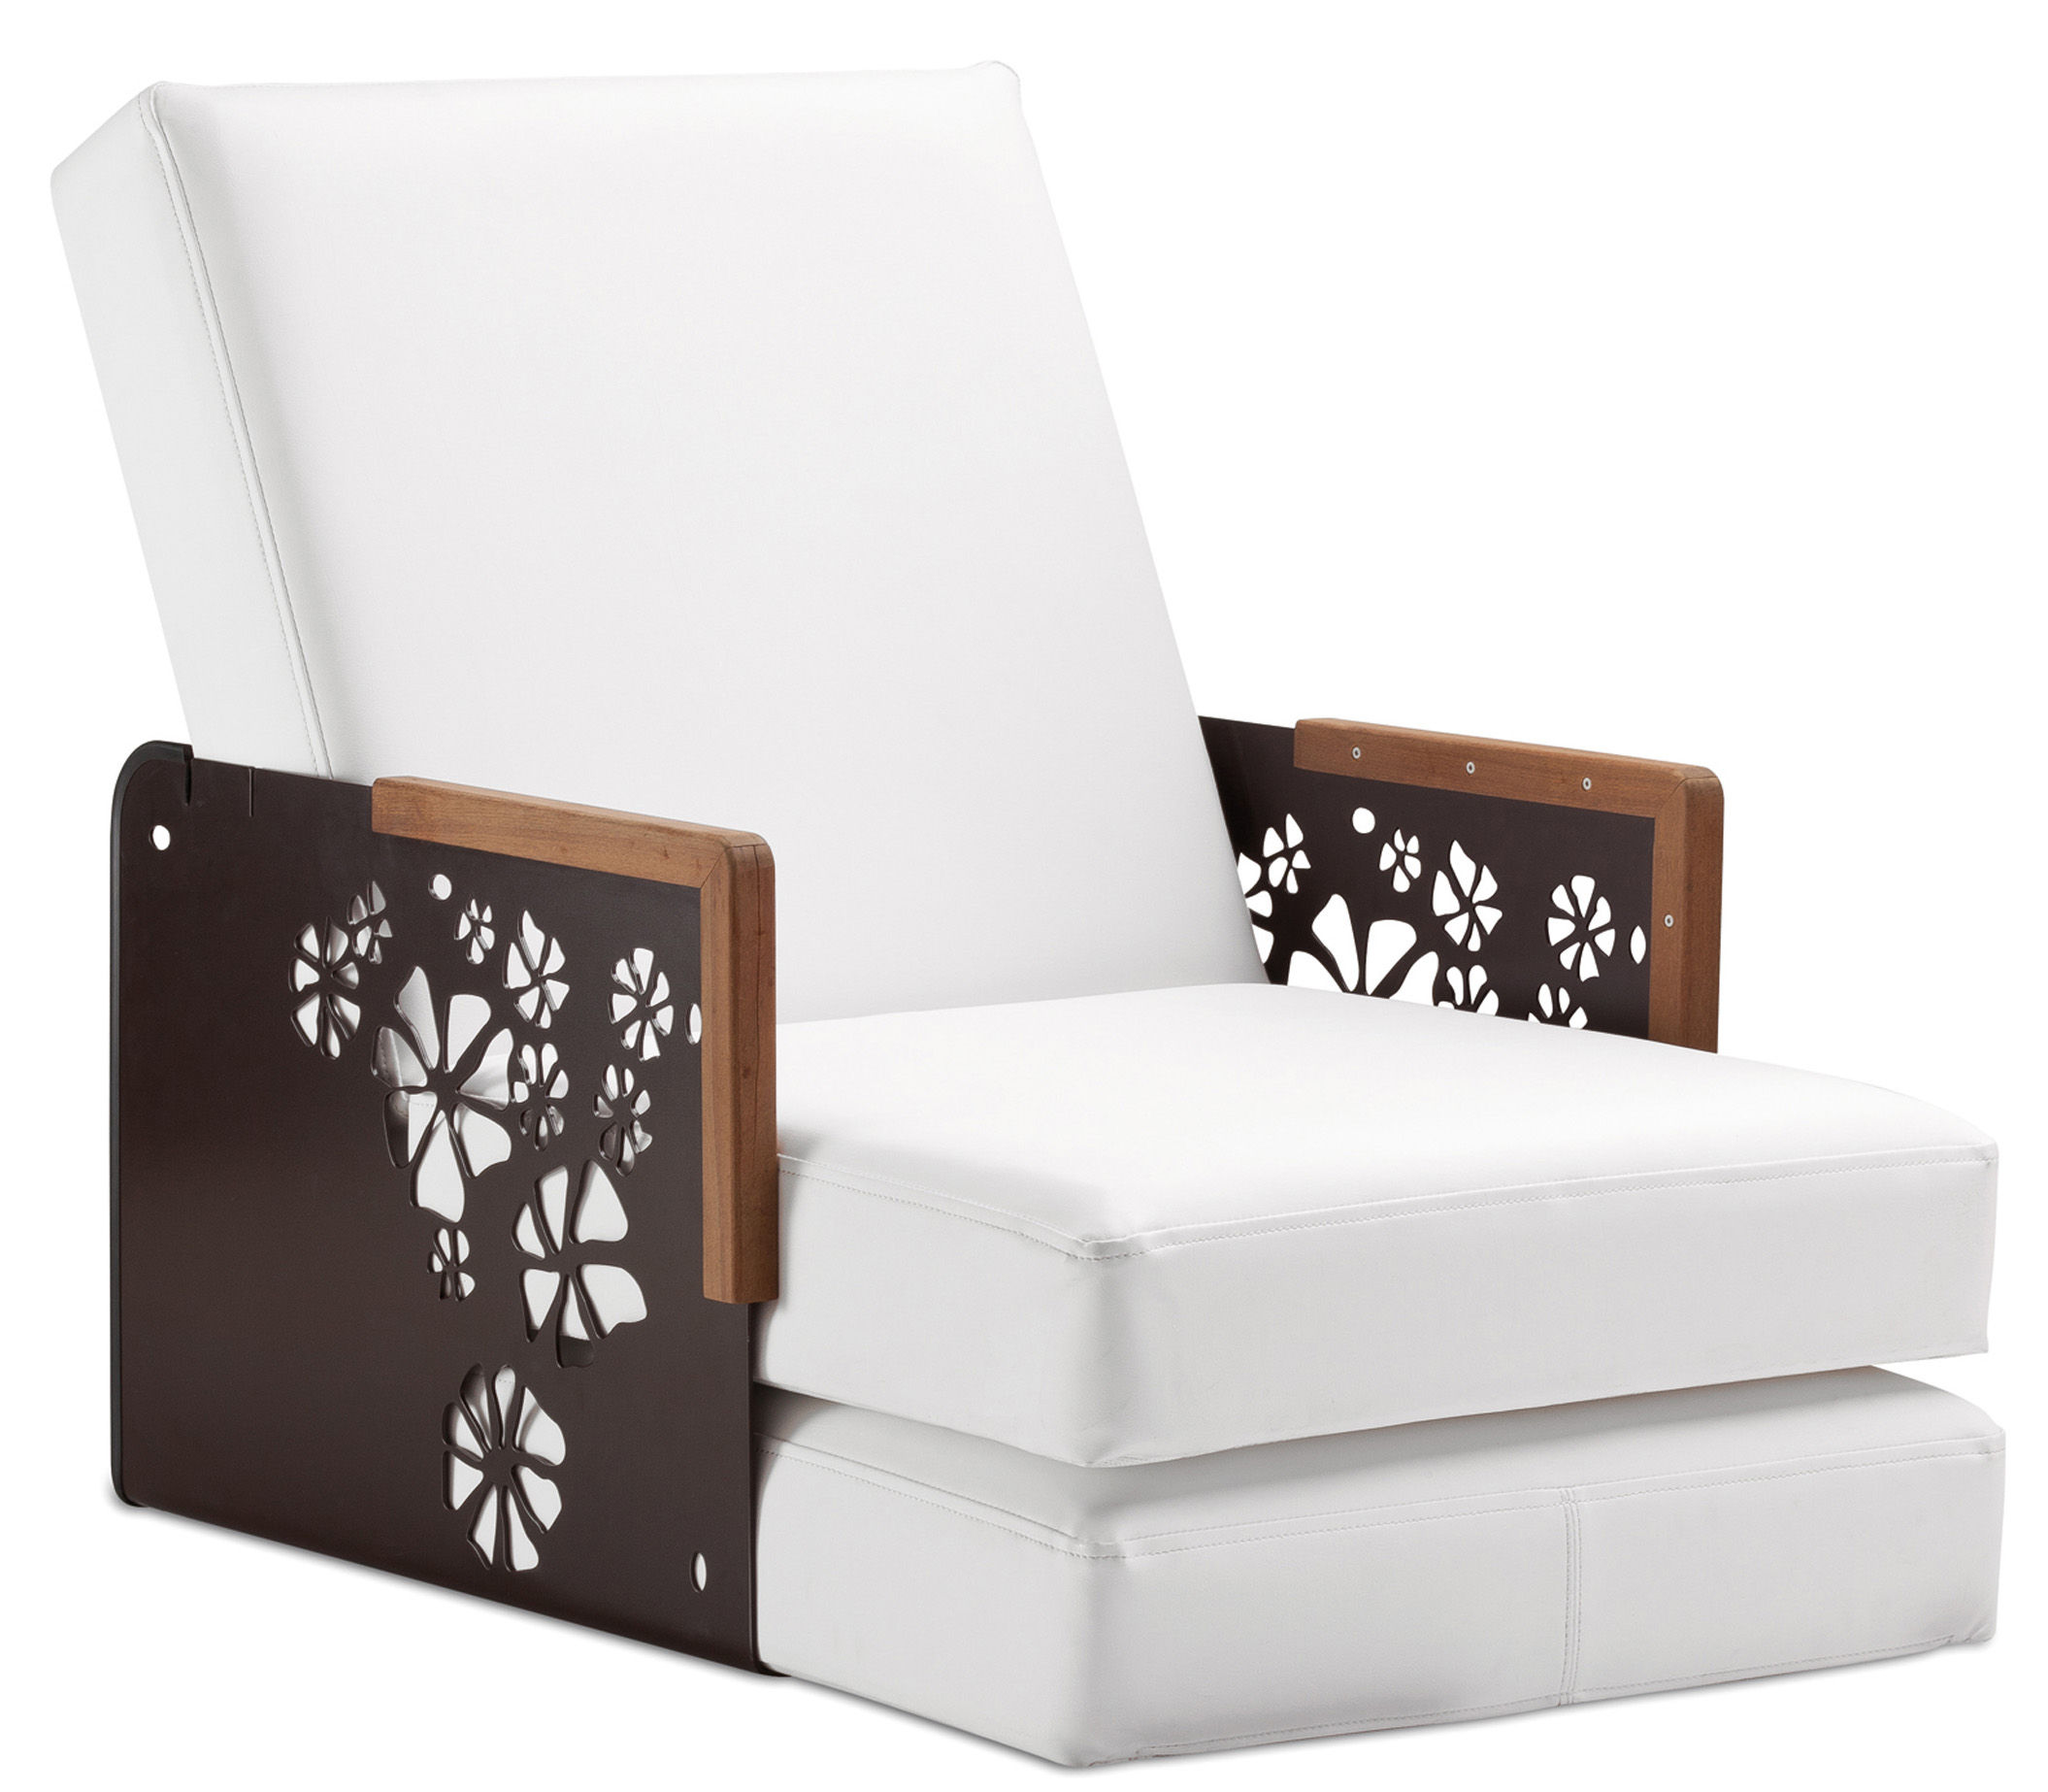 chauffeuse convertible kube bain de soleil table basse structure argent avec angles blancs. Black Bedroom Furniture Sets. Home Design Ideas